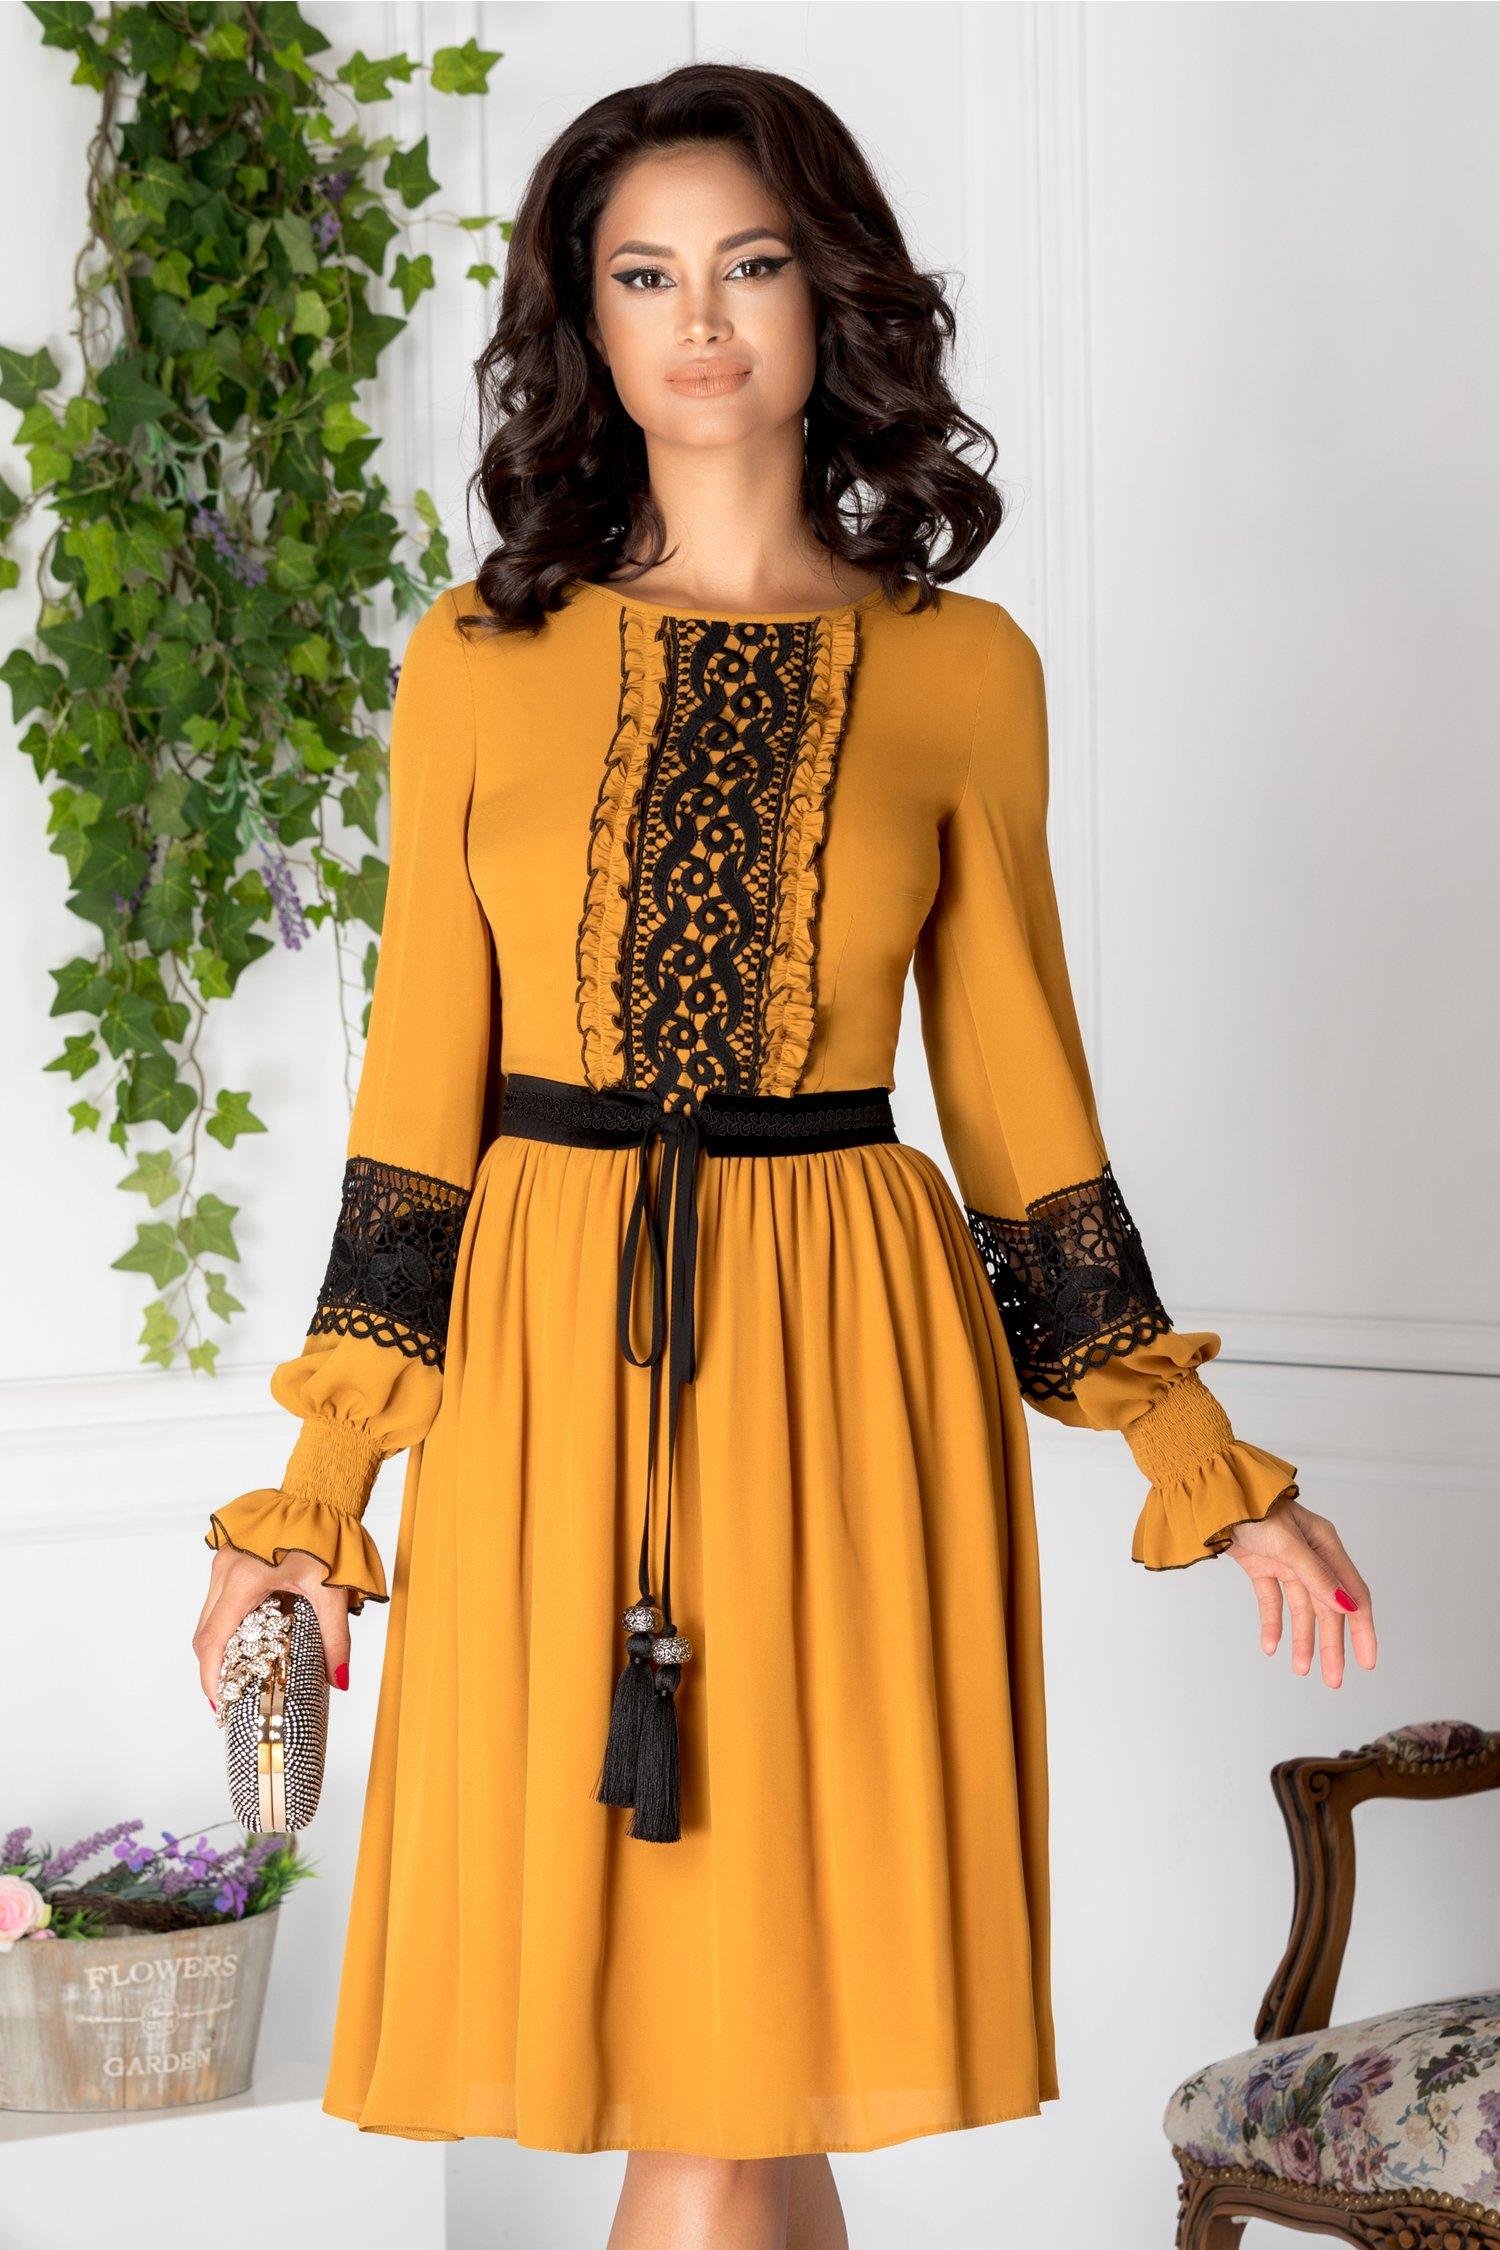 Rochie LaDonna galben mustar cu detalii vintage negre